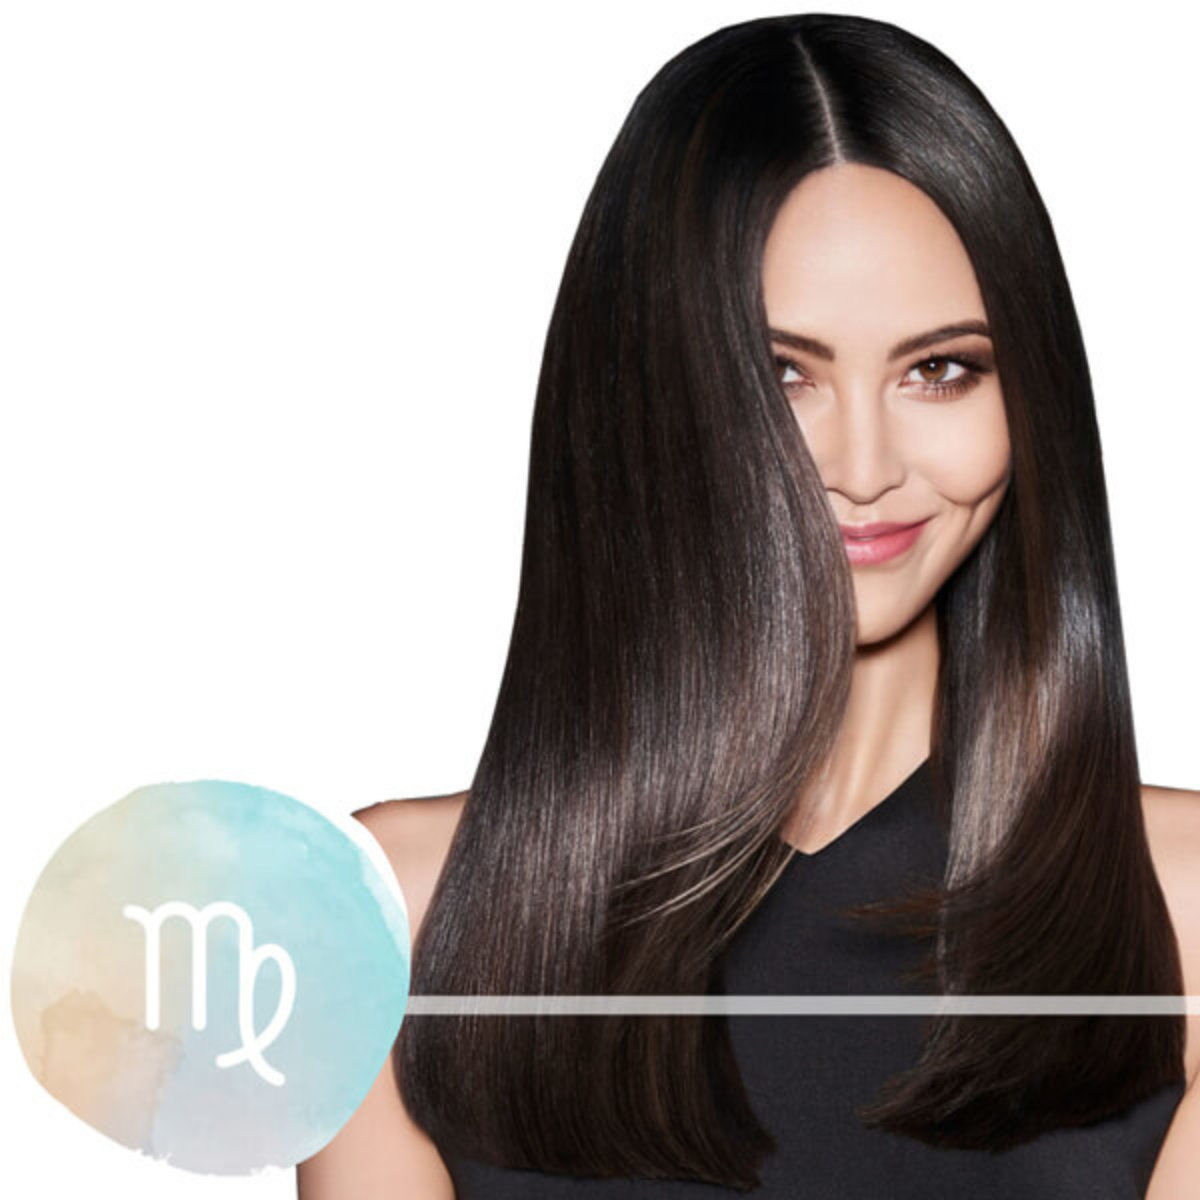 Model with dark black silky hair